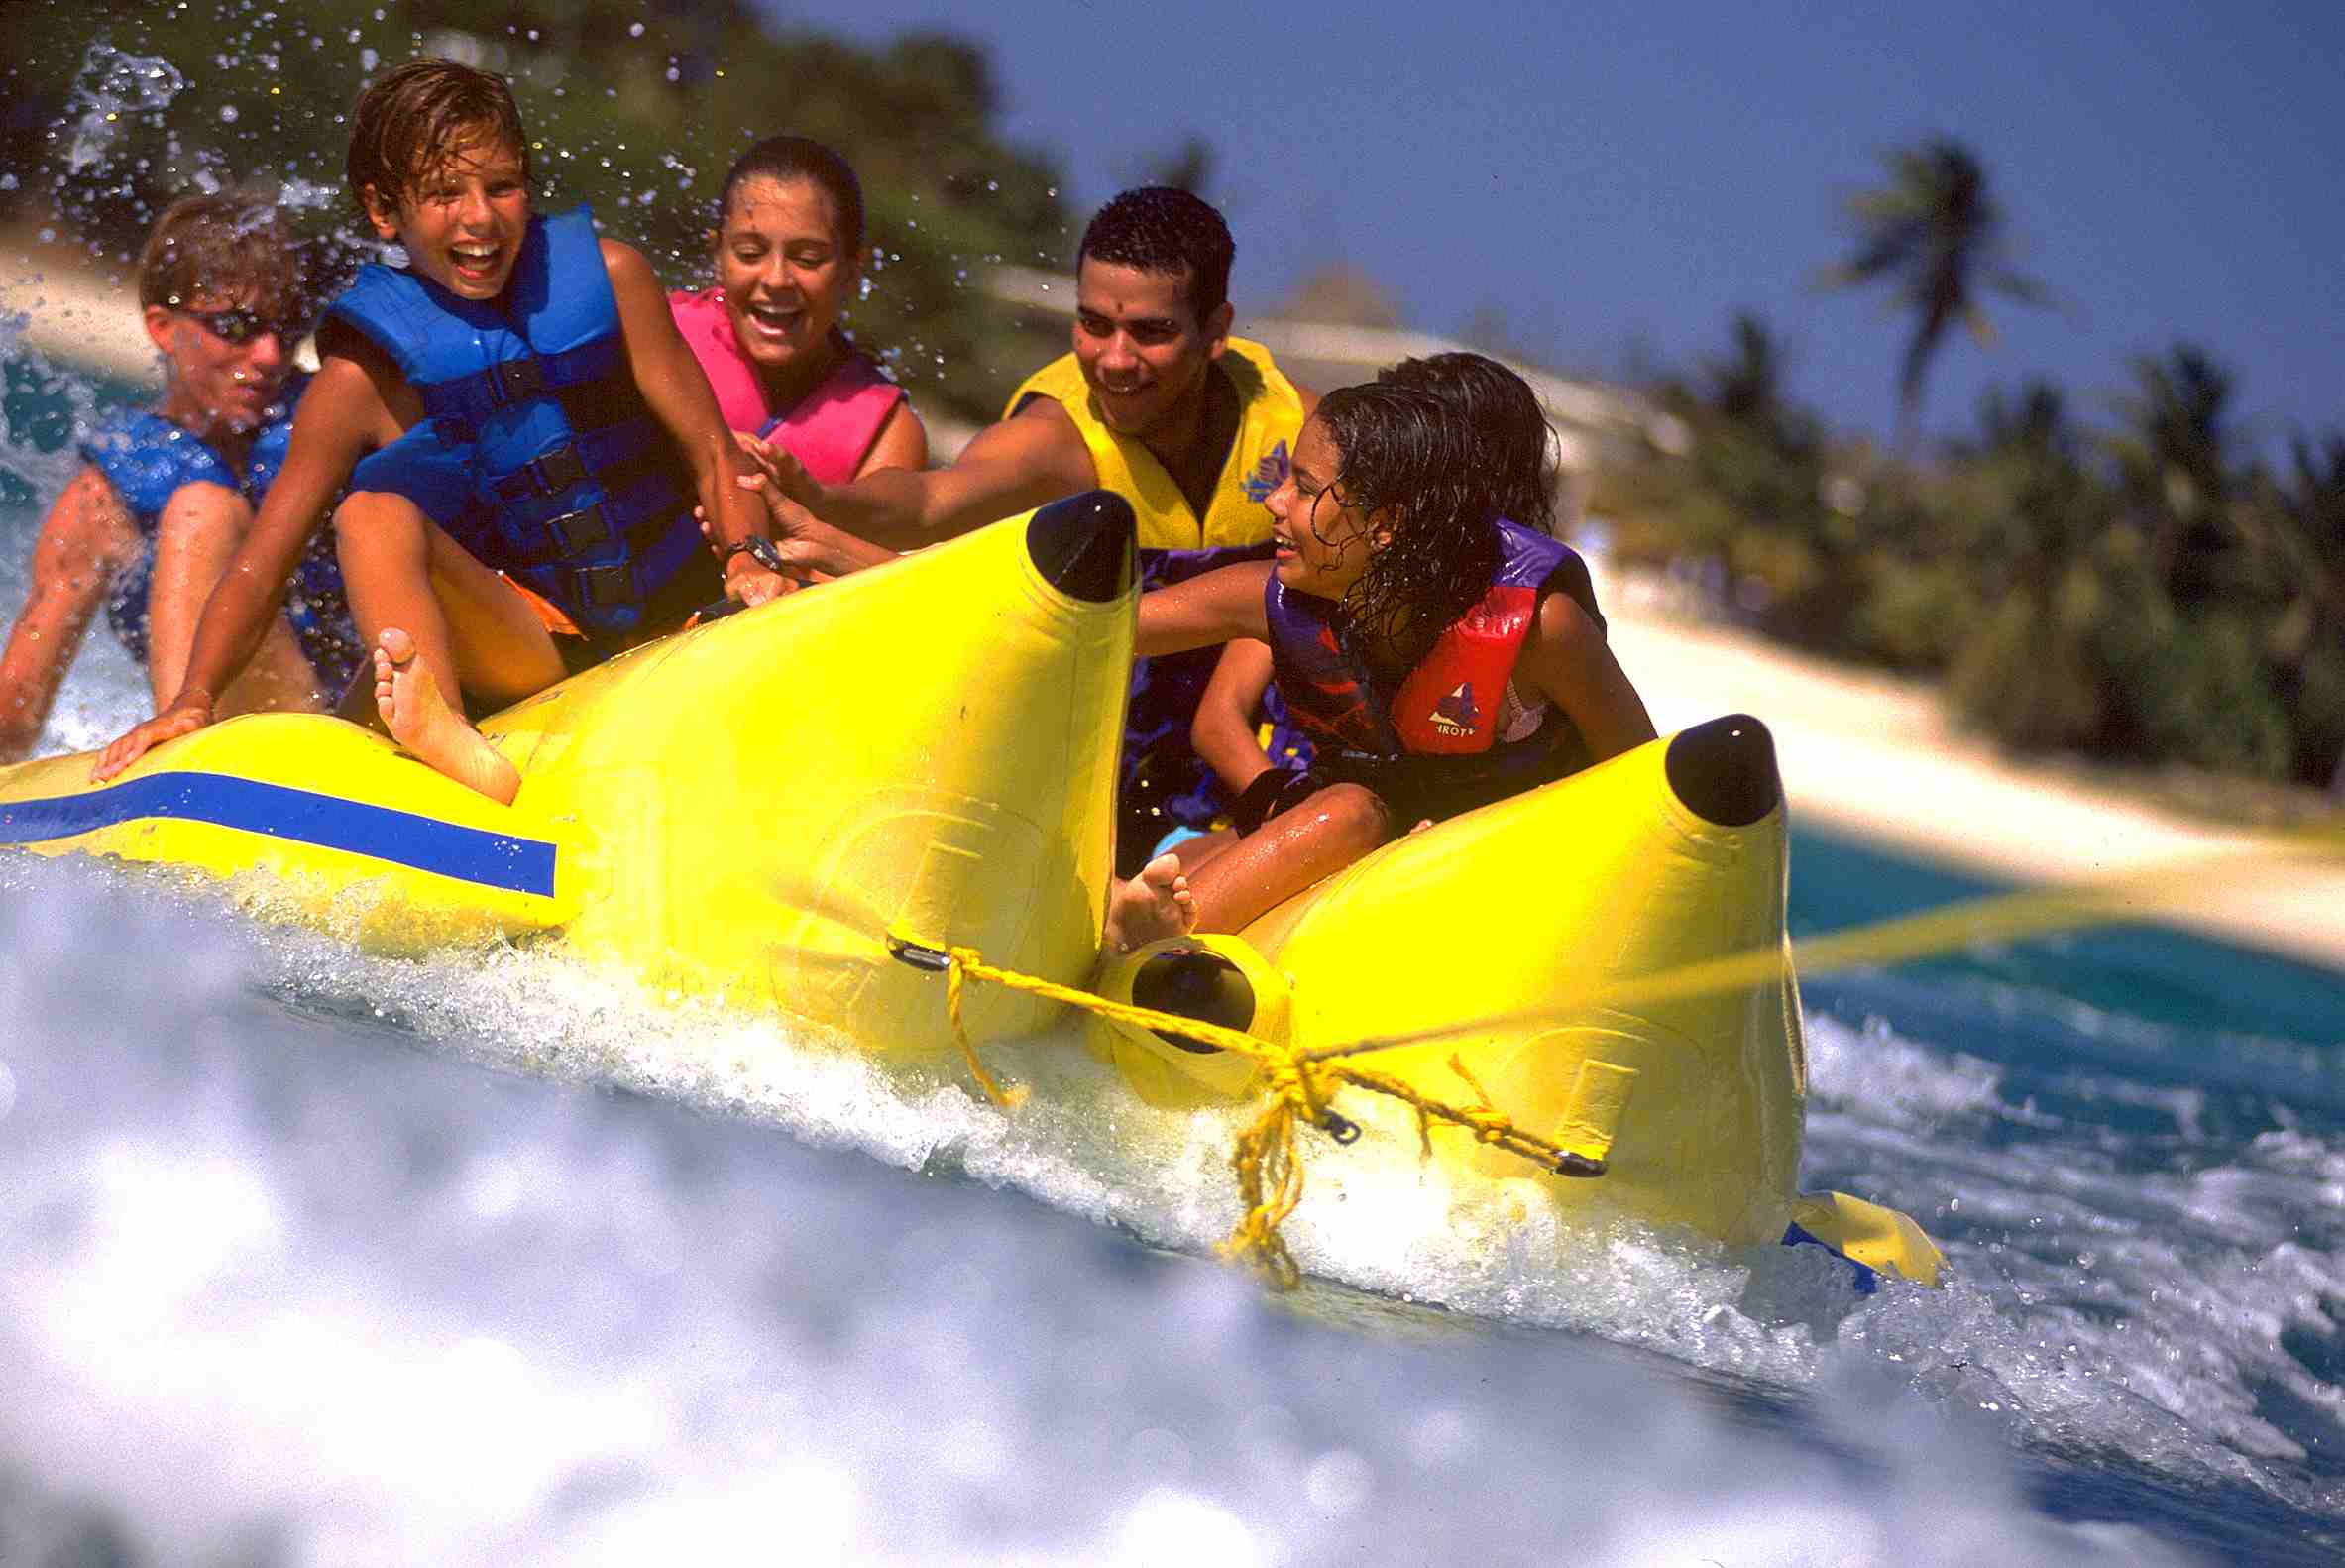 Banana boating off the shore of Aruba.